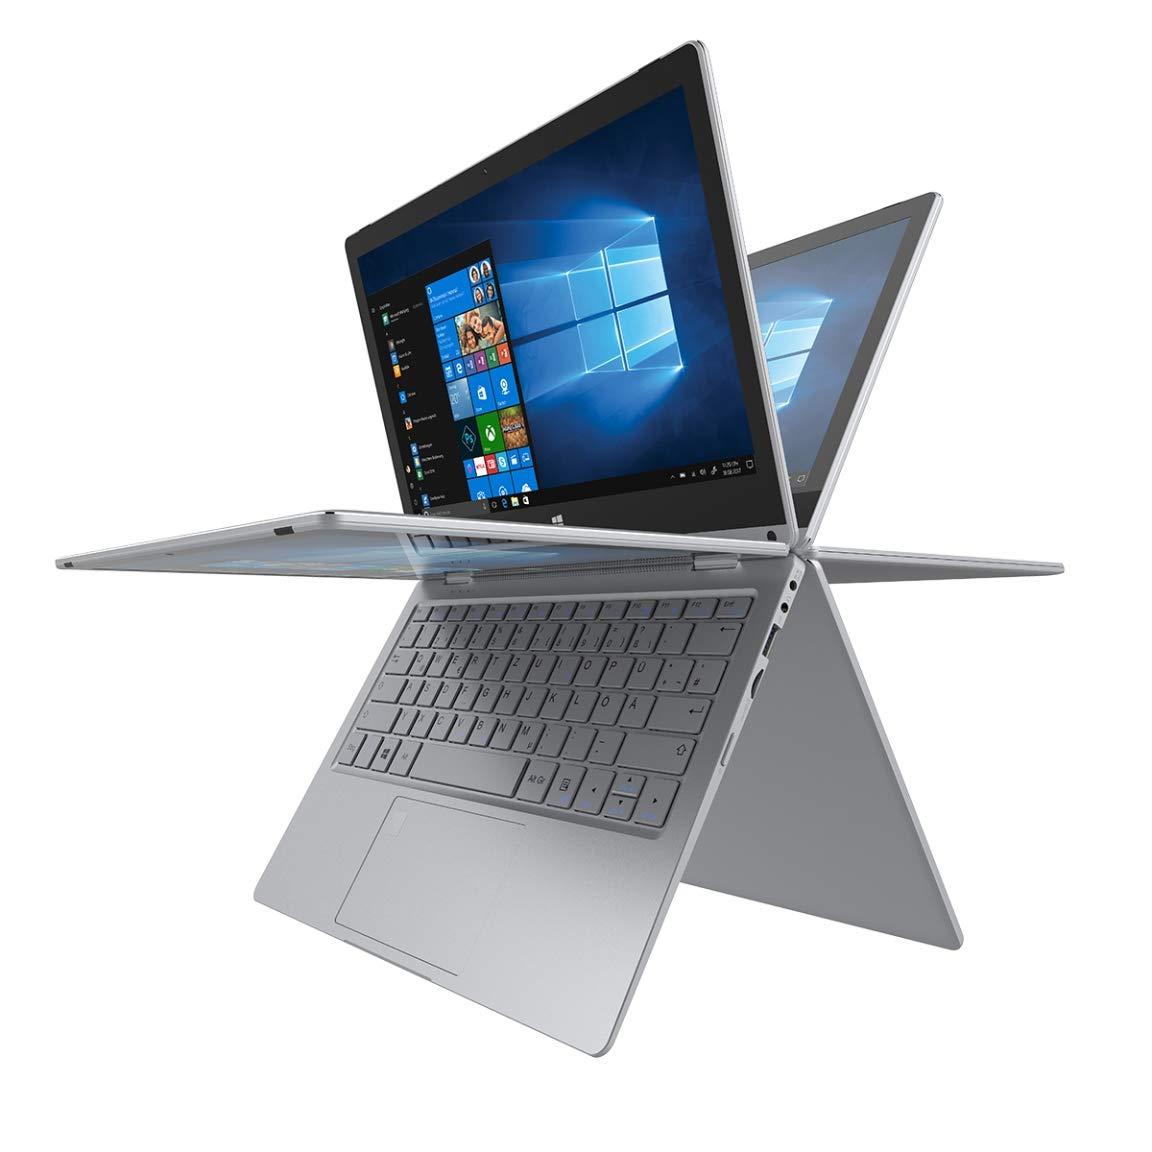 TREKSTOR PRIMEBOOK C11B-CO, Convertible (11,6 Zoll Full-HD IPS Touch Display, Intel Celeron N3350, 4 GB RAM, 64 GB Speicher, Fingerprintsensor, Windows 10, inkl. Office 365) silber